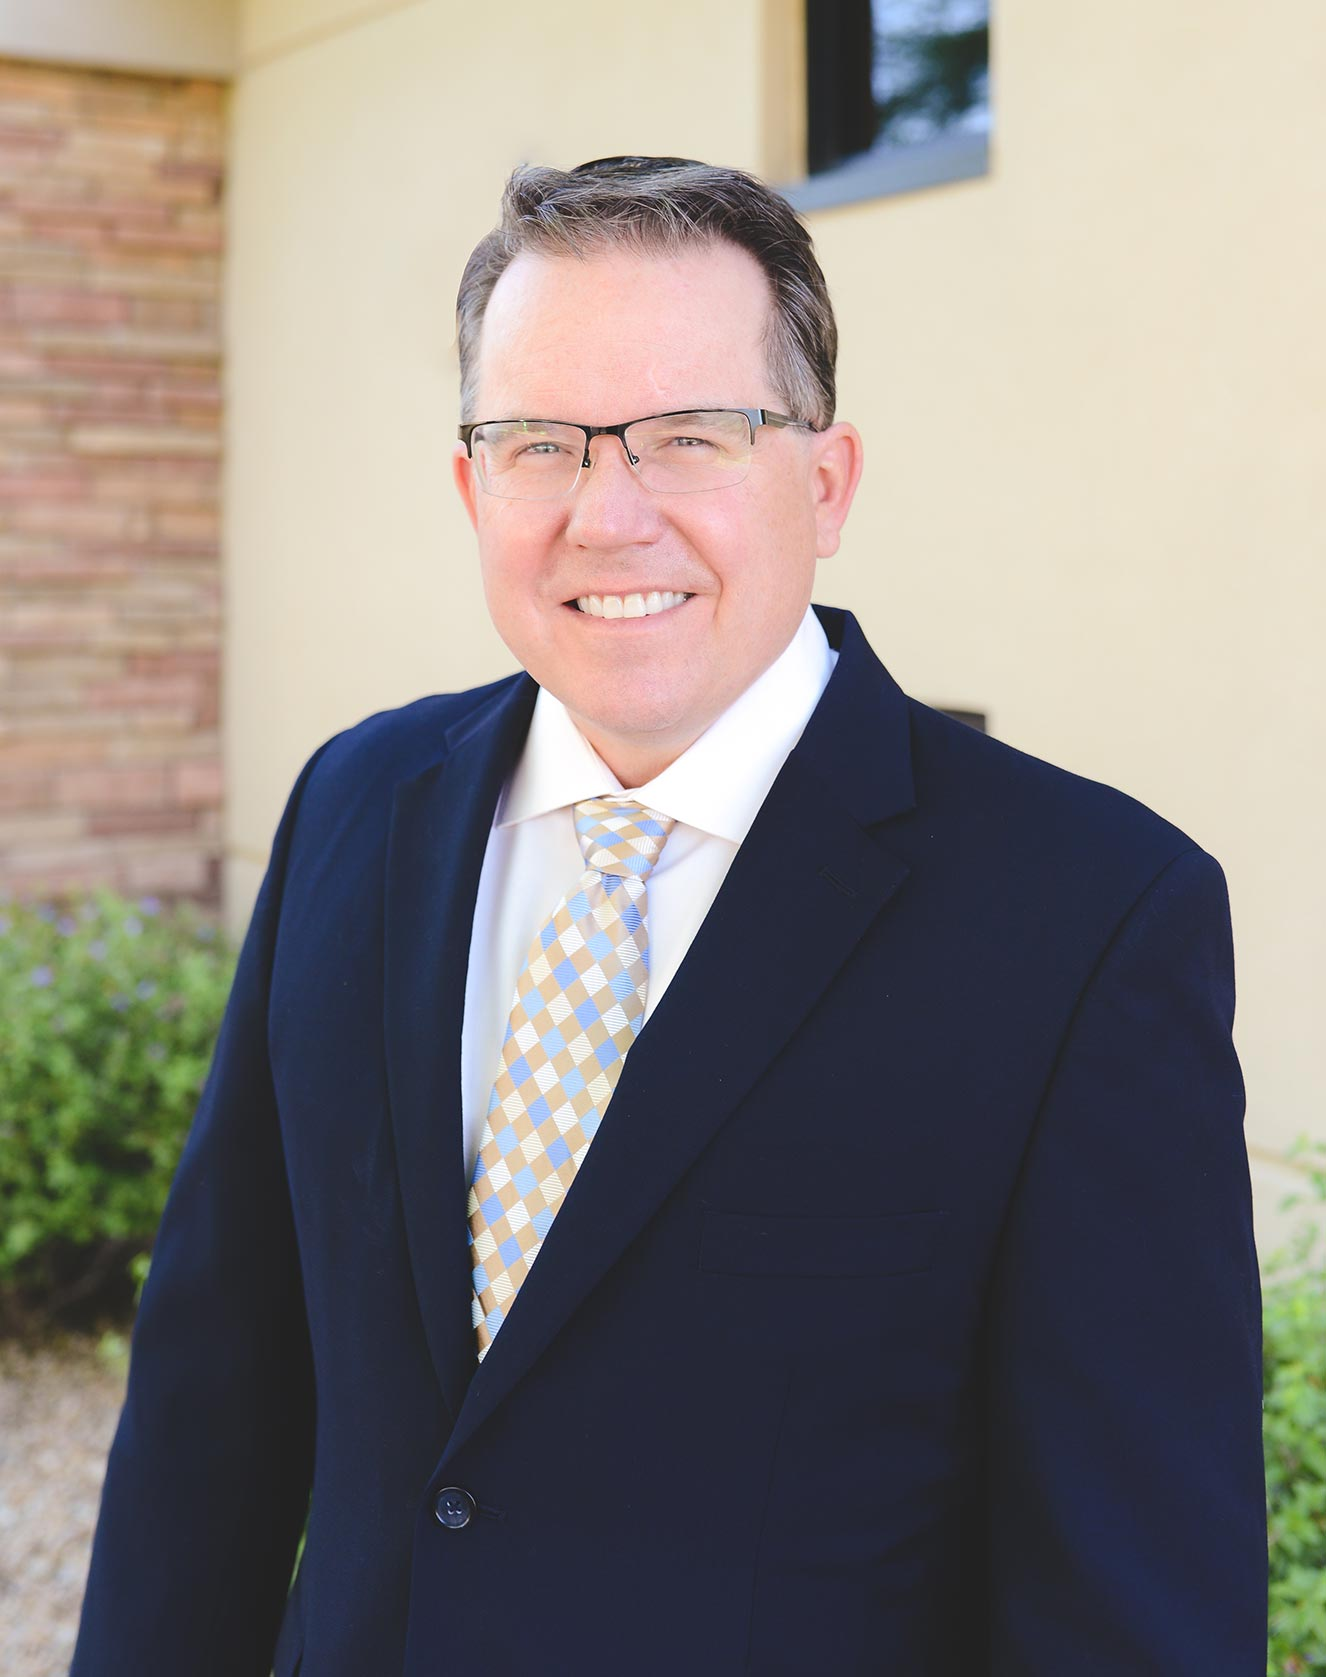 Jonathan Wiggenhorn, DO, FAOCO